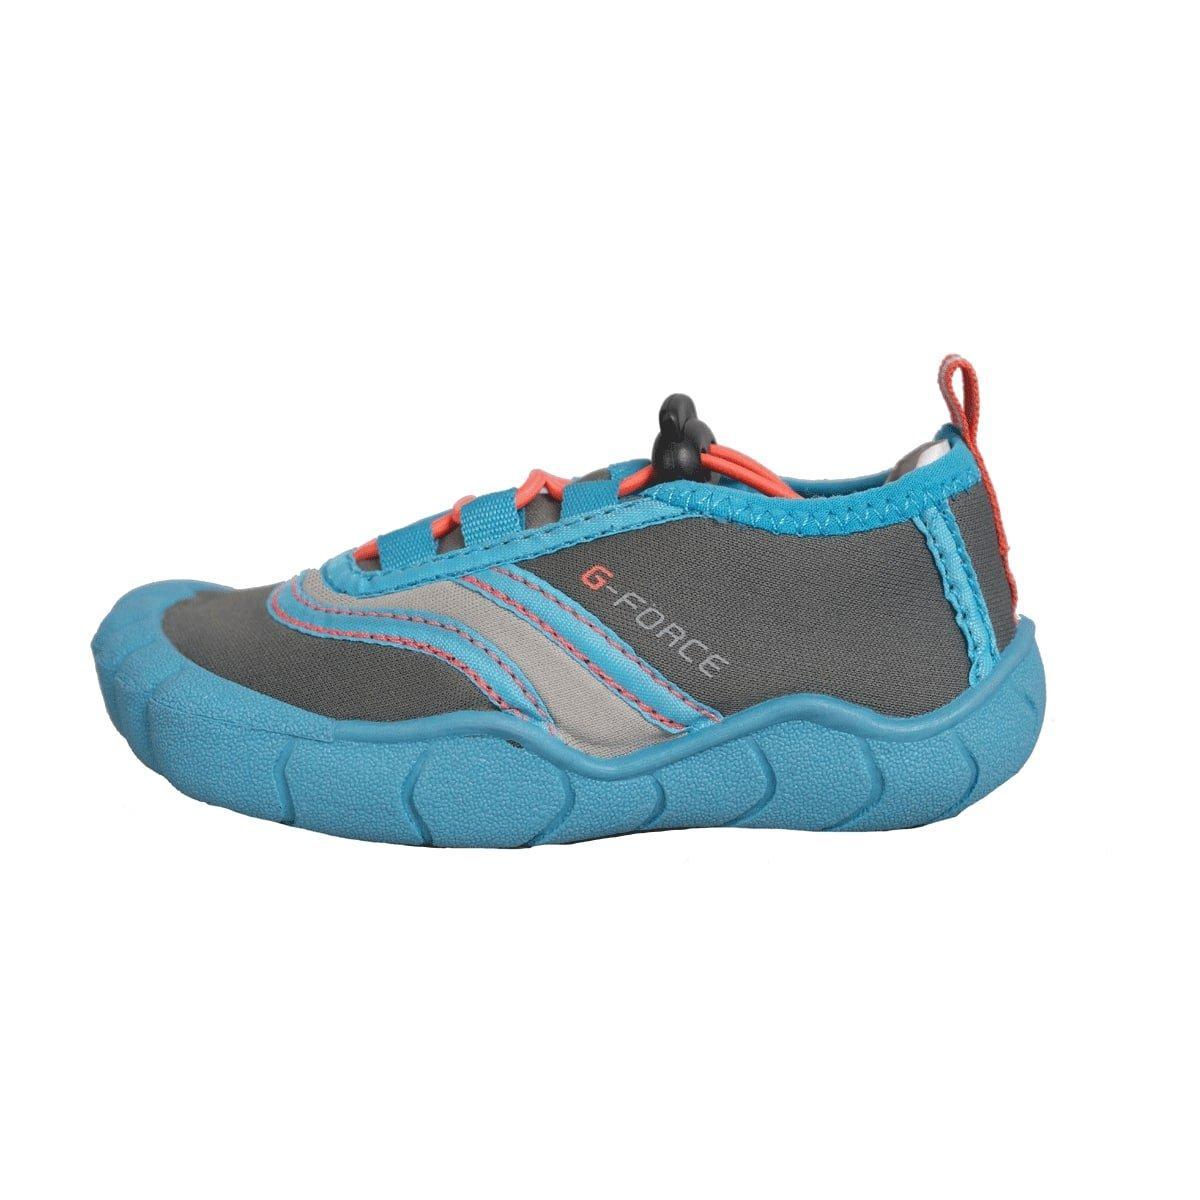 Gul Junior Aqua Shoe 6-13